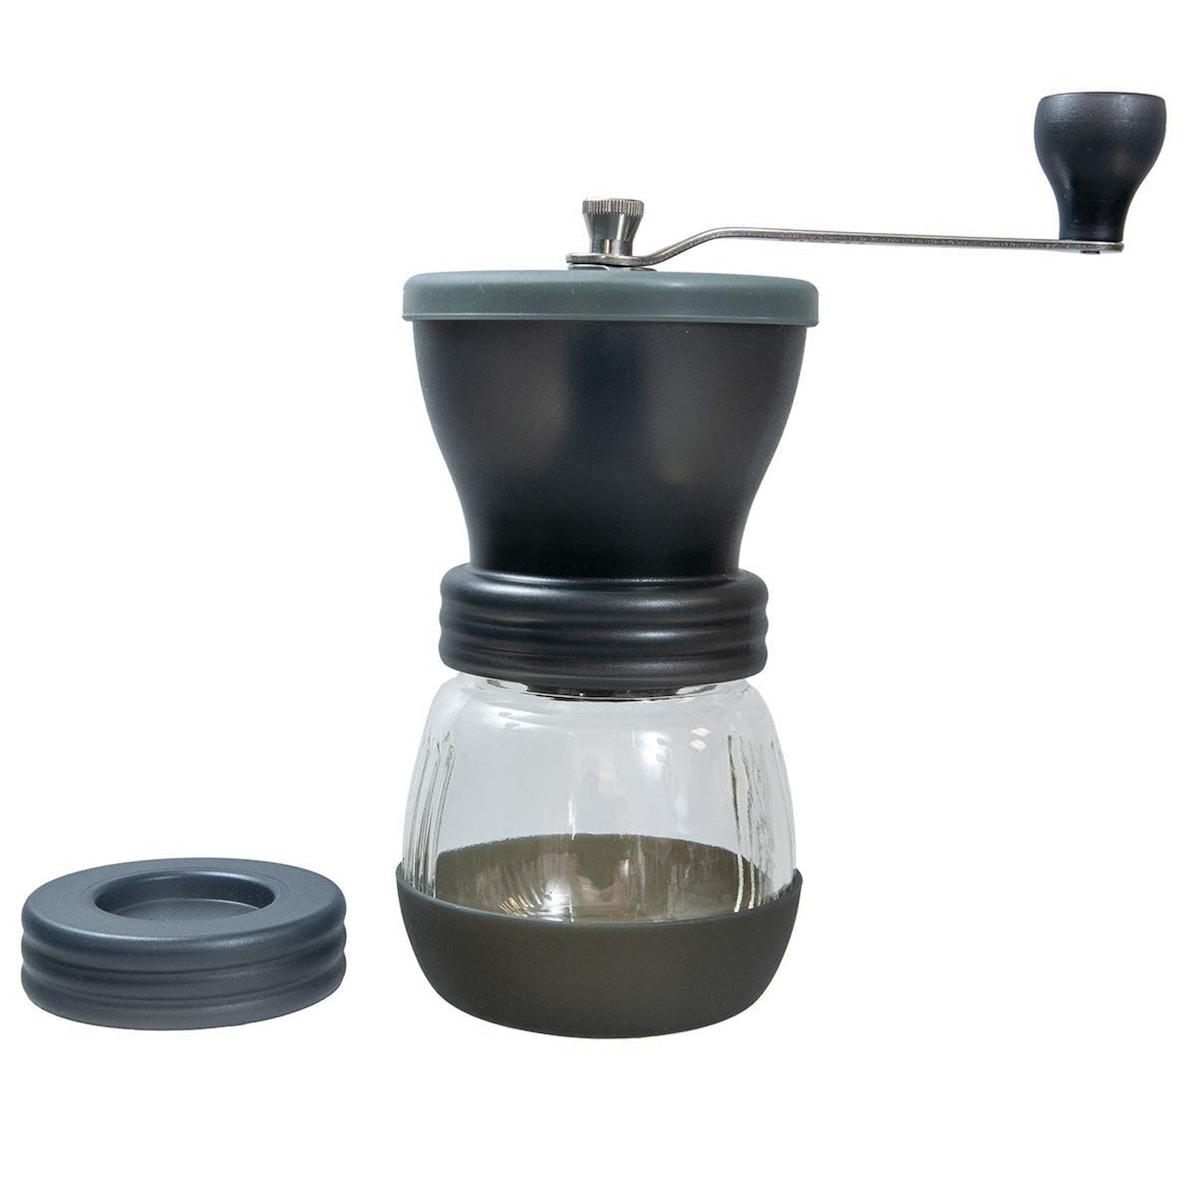 Hario Coffee Mill